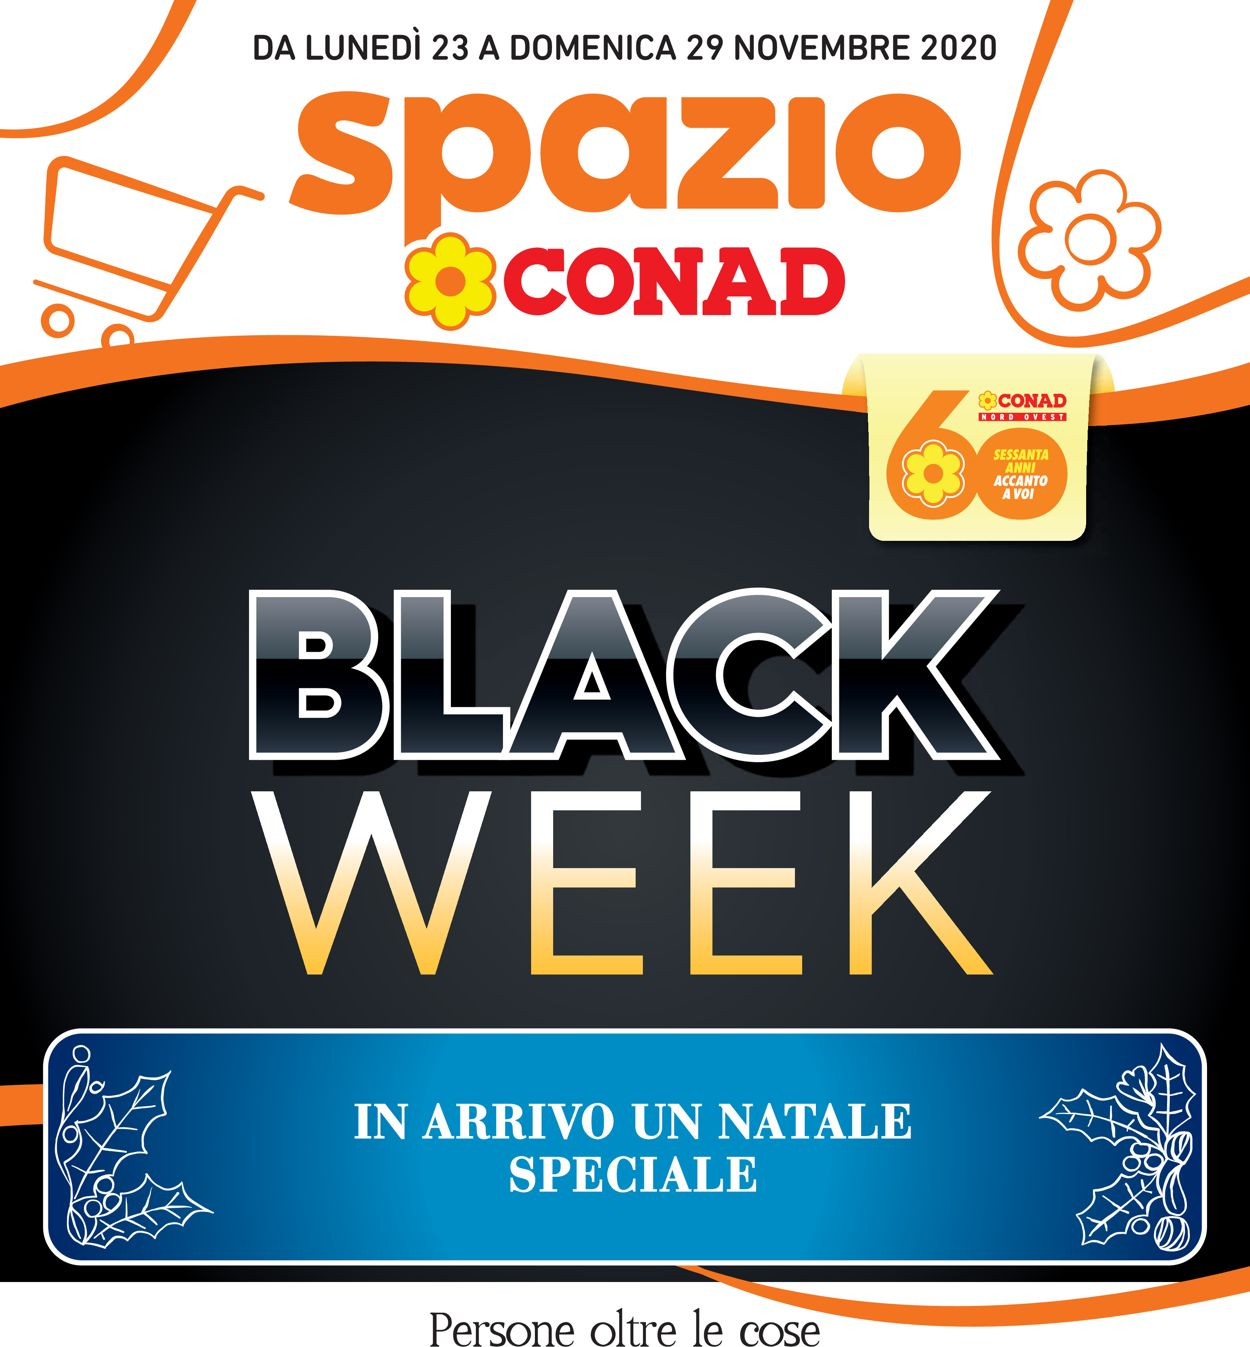 Volantino Conad - Black Friday 2020 - Offerte 23/11-29/11/2020